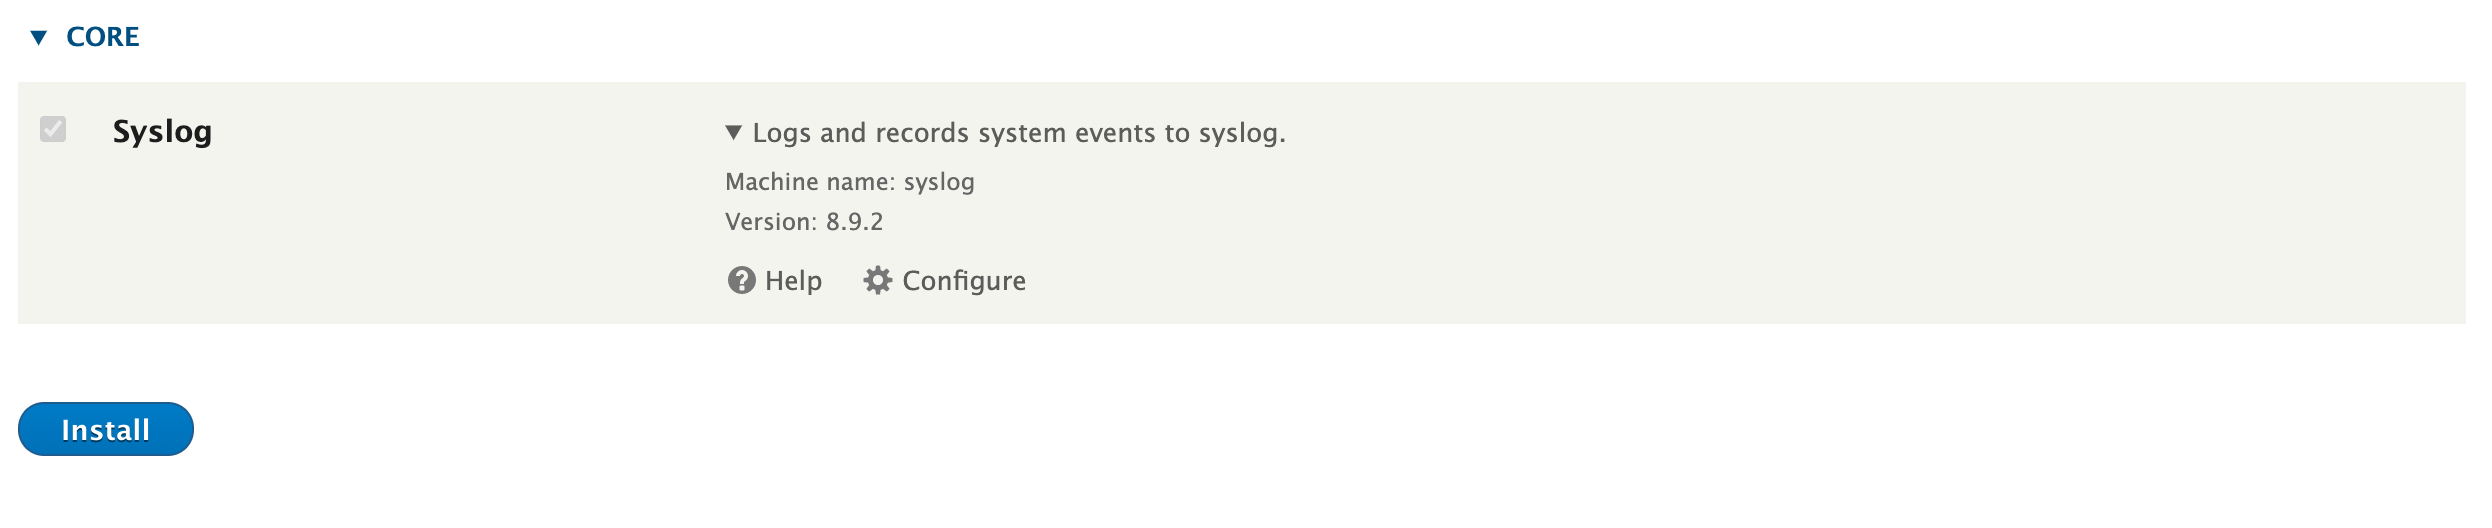 Syslog installation via the Drupal UI